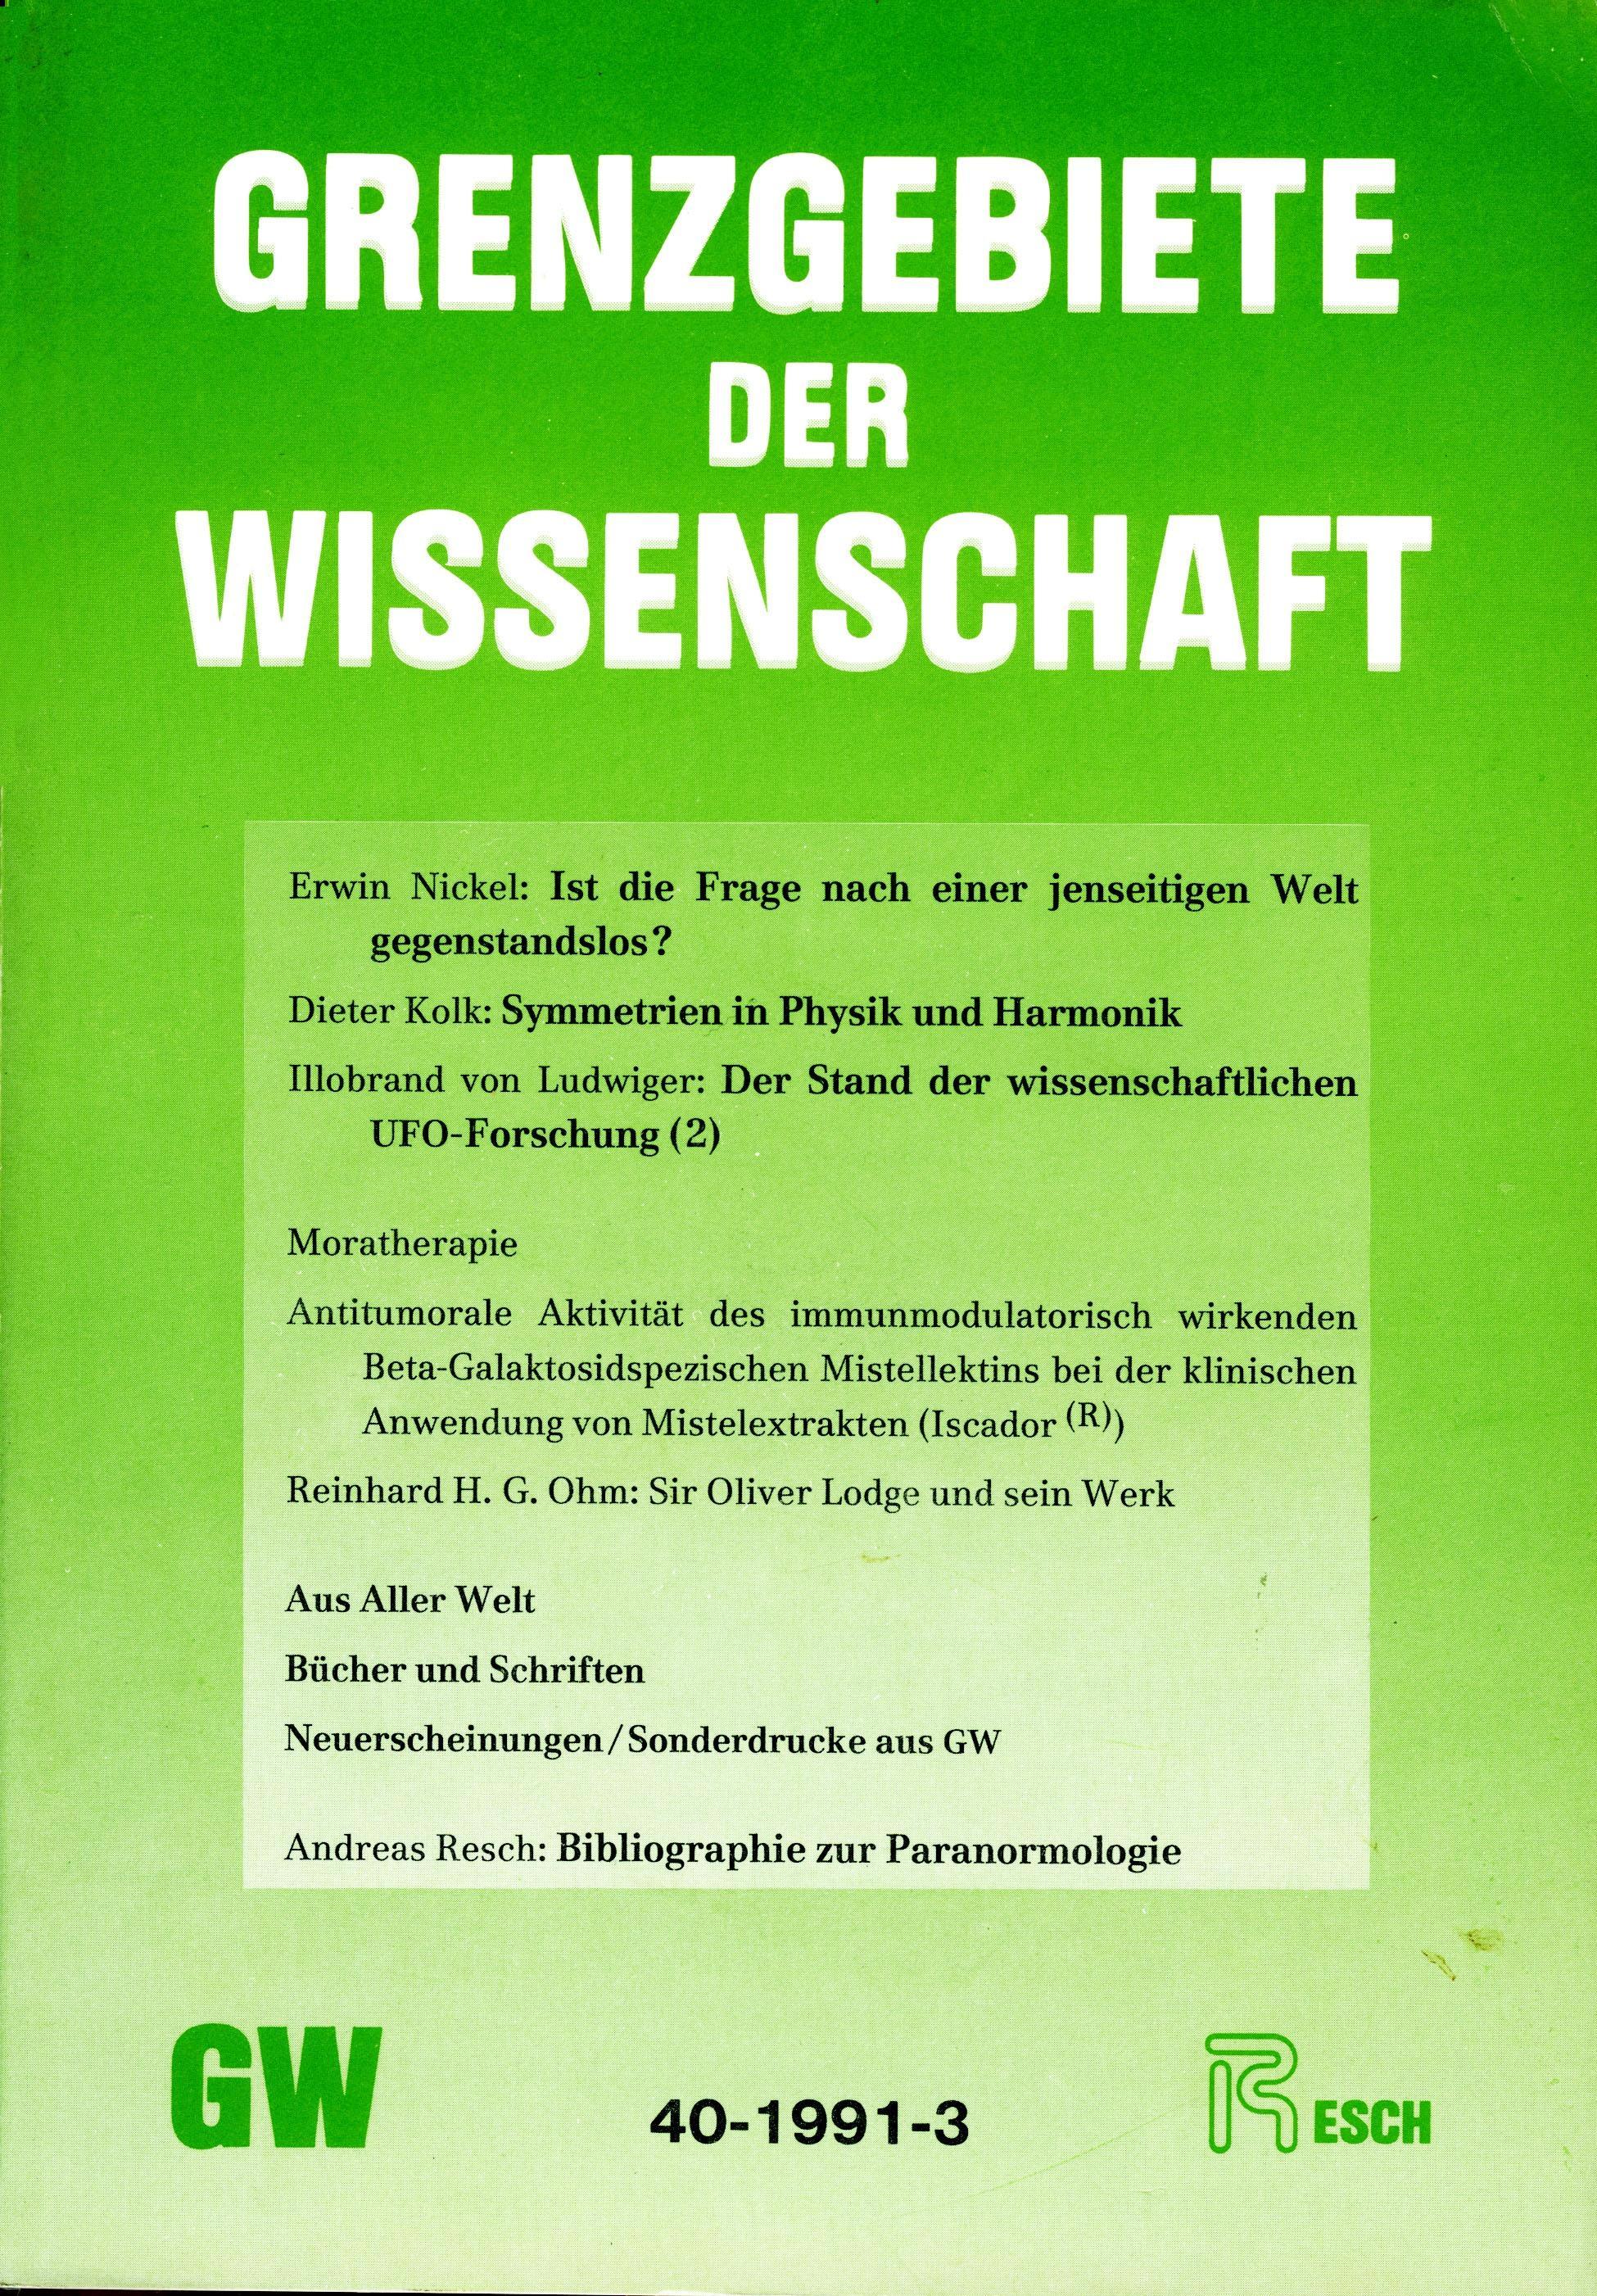 GW_1991_3